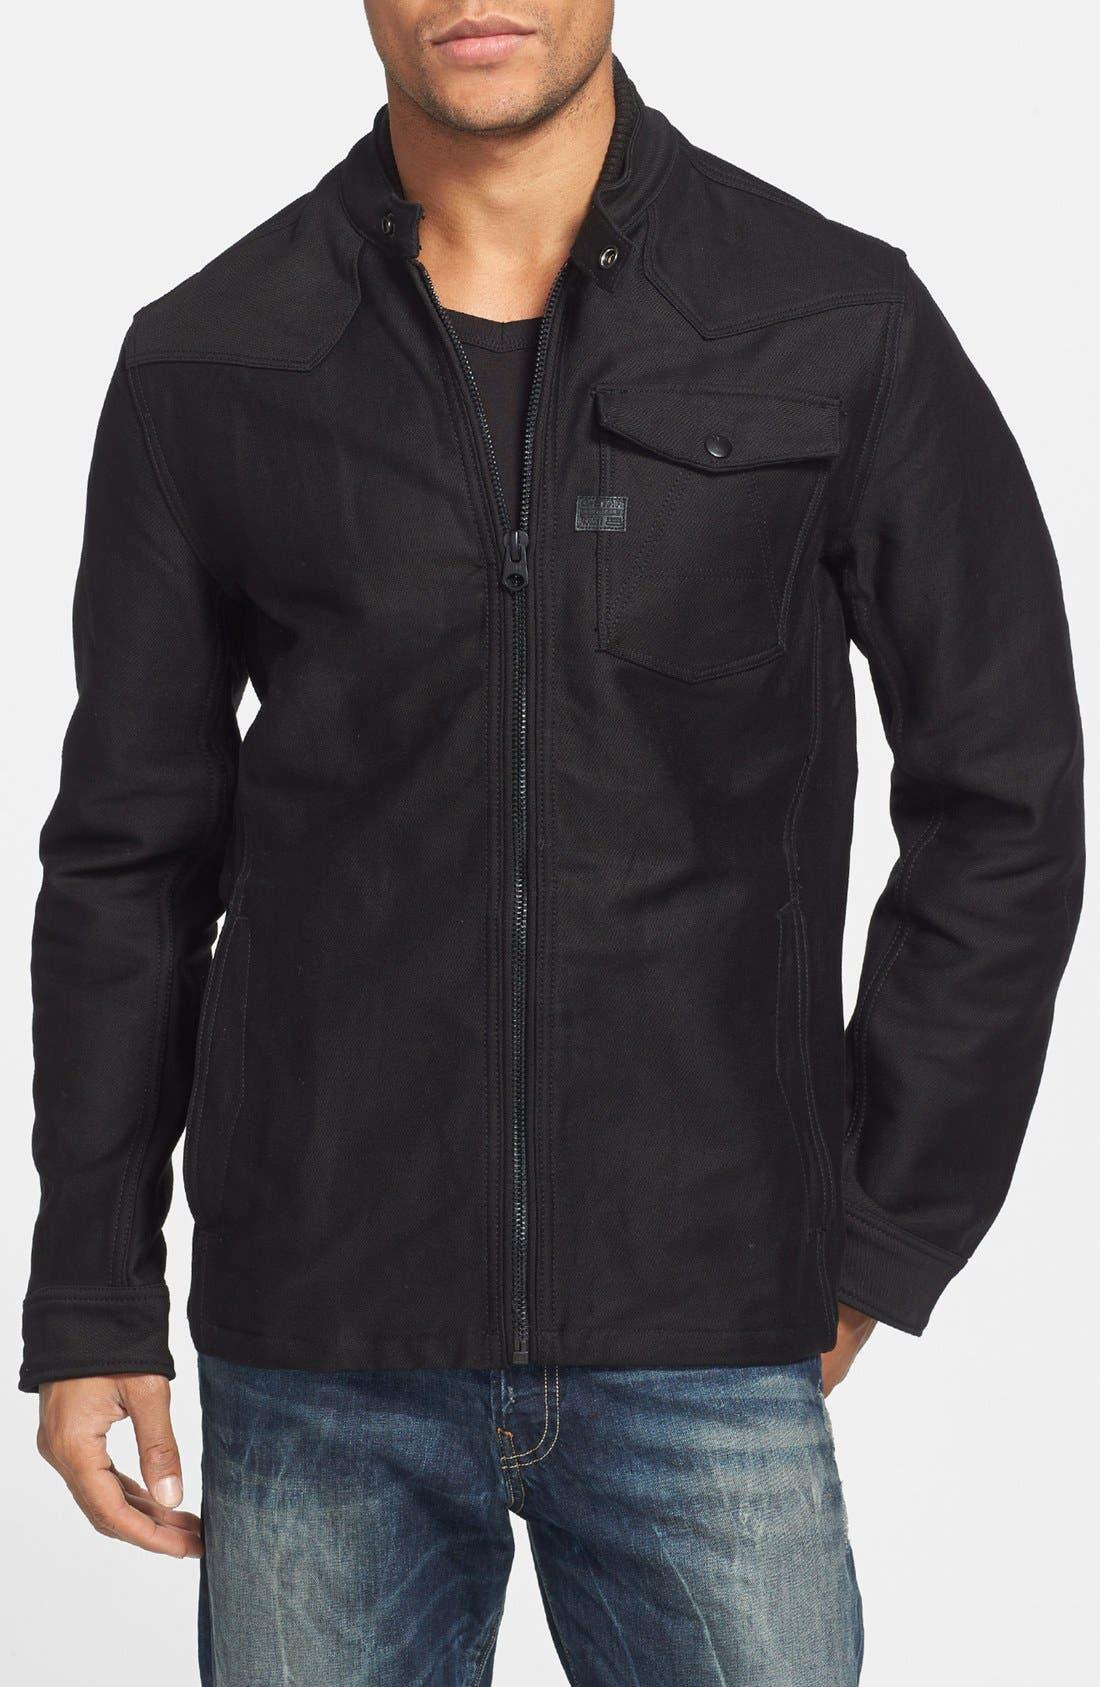 Alternate Image 1 Selected - G-Star Raw Cotton Canvas Shirt Jacket